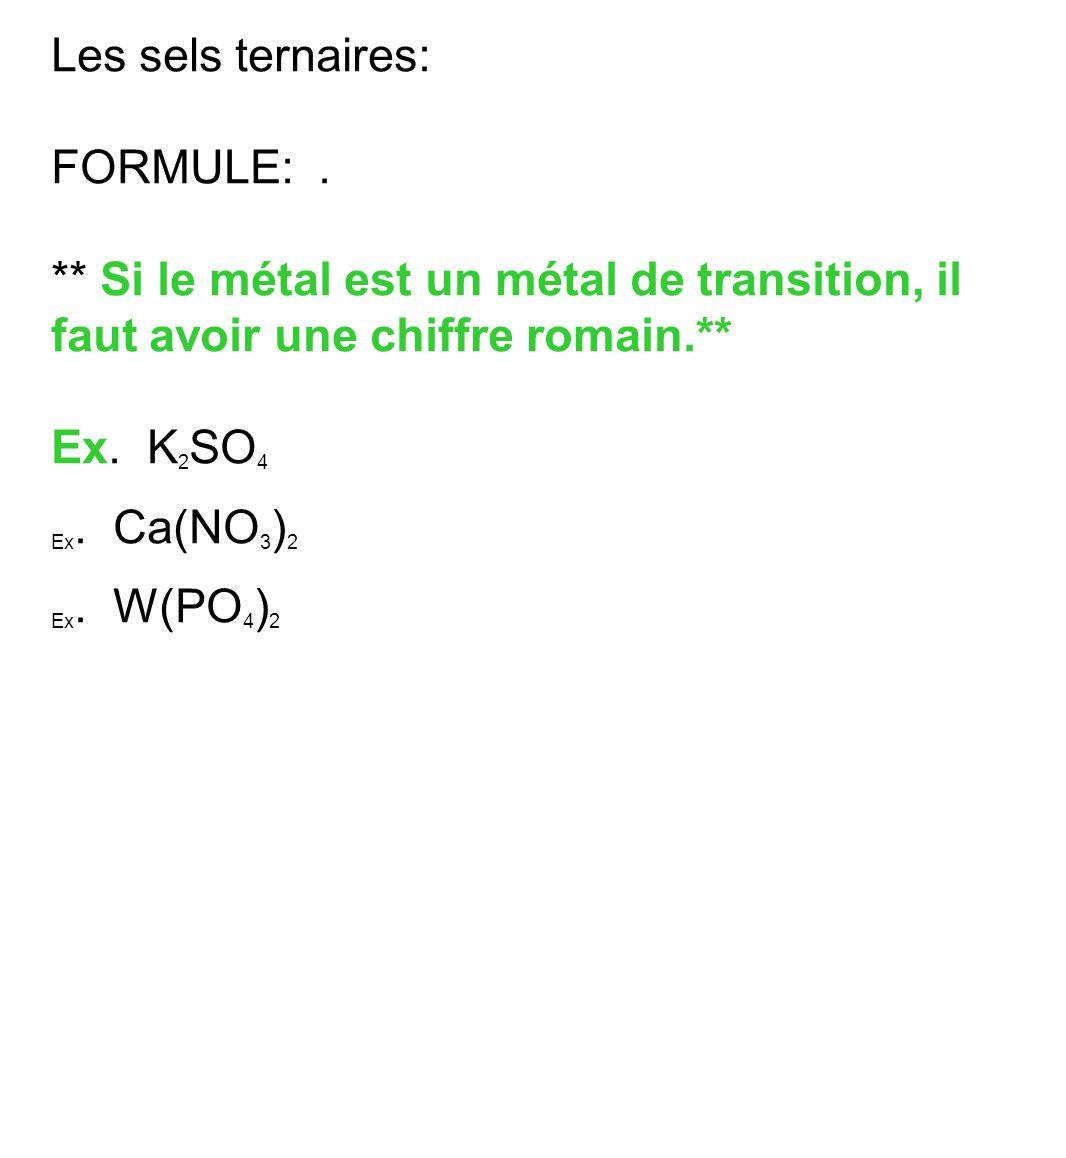 Les sels ternaires: FORMULE: .